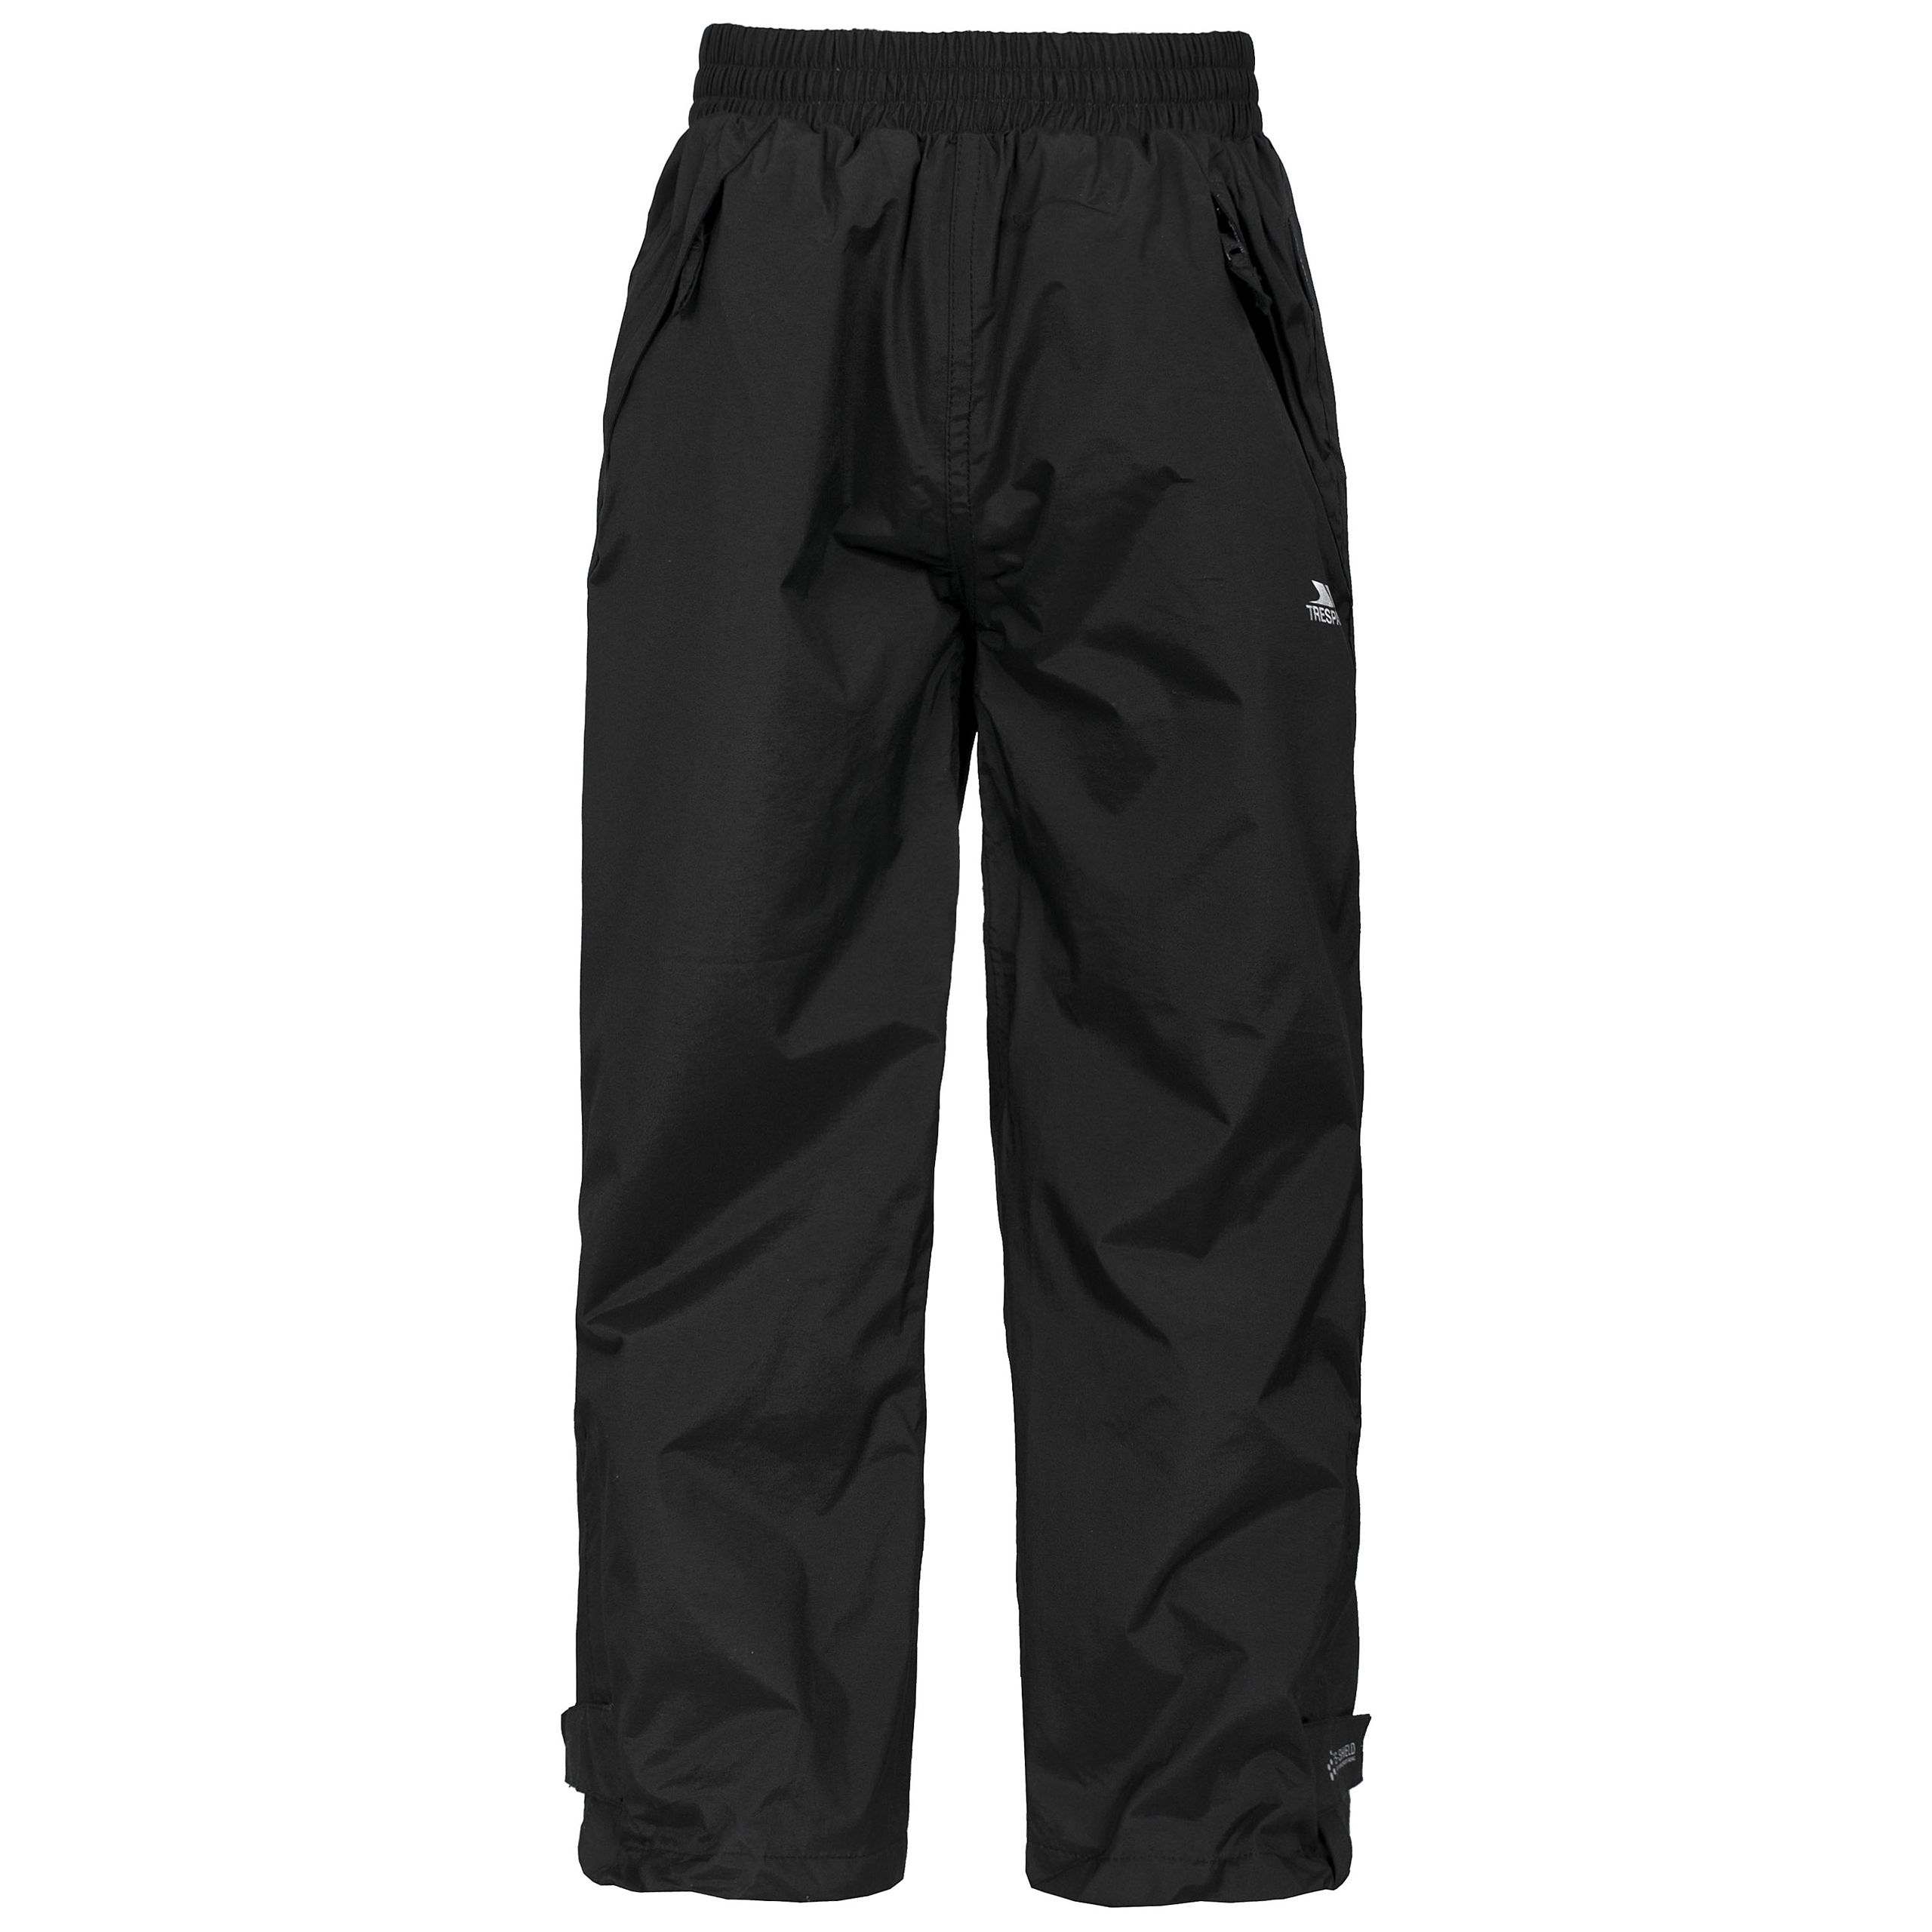 Gonzalez Mens Dlx Waterproof Recco Ski Jacket